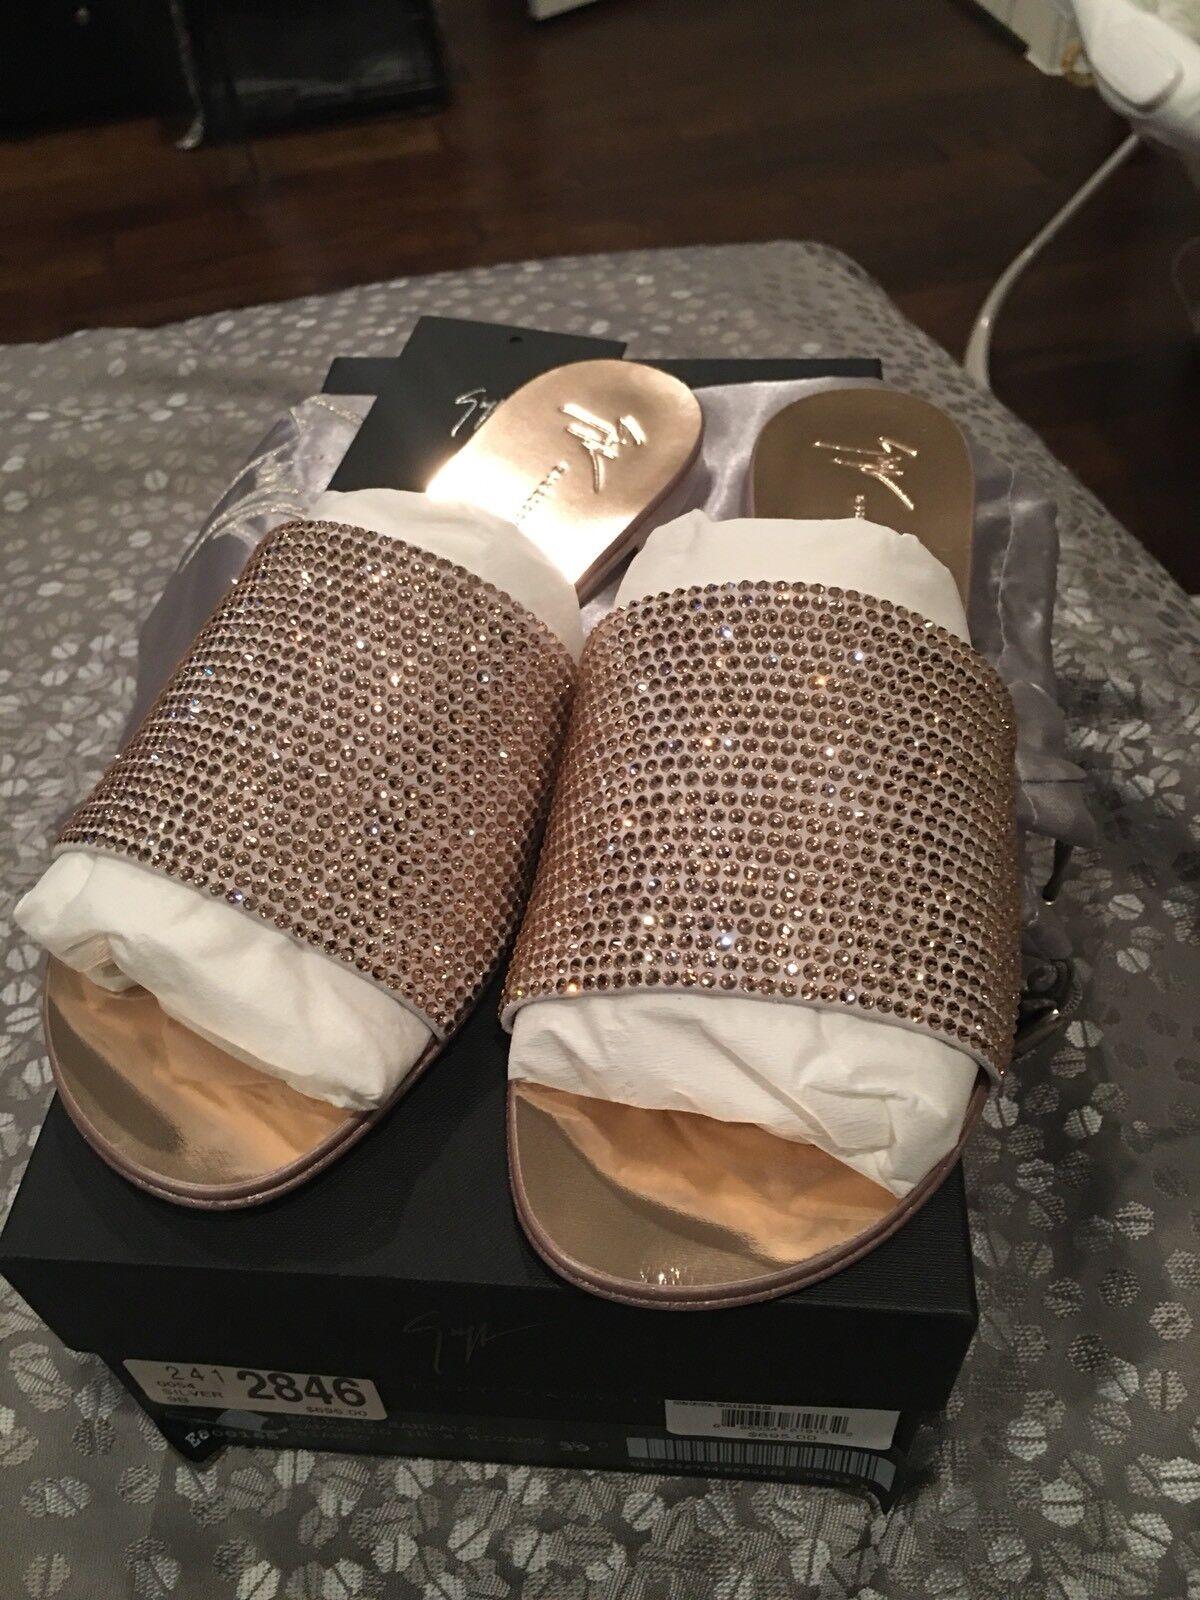 Giuseppe Zanotti Swarovski kristaller Sandals Adelia Storlek 39 USA 8.5 BNWT